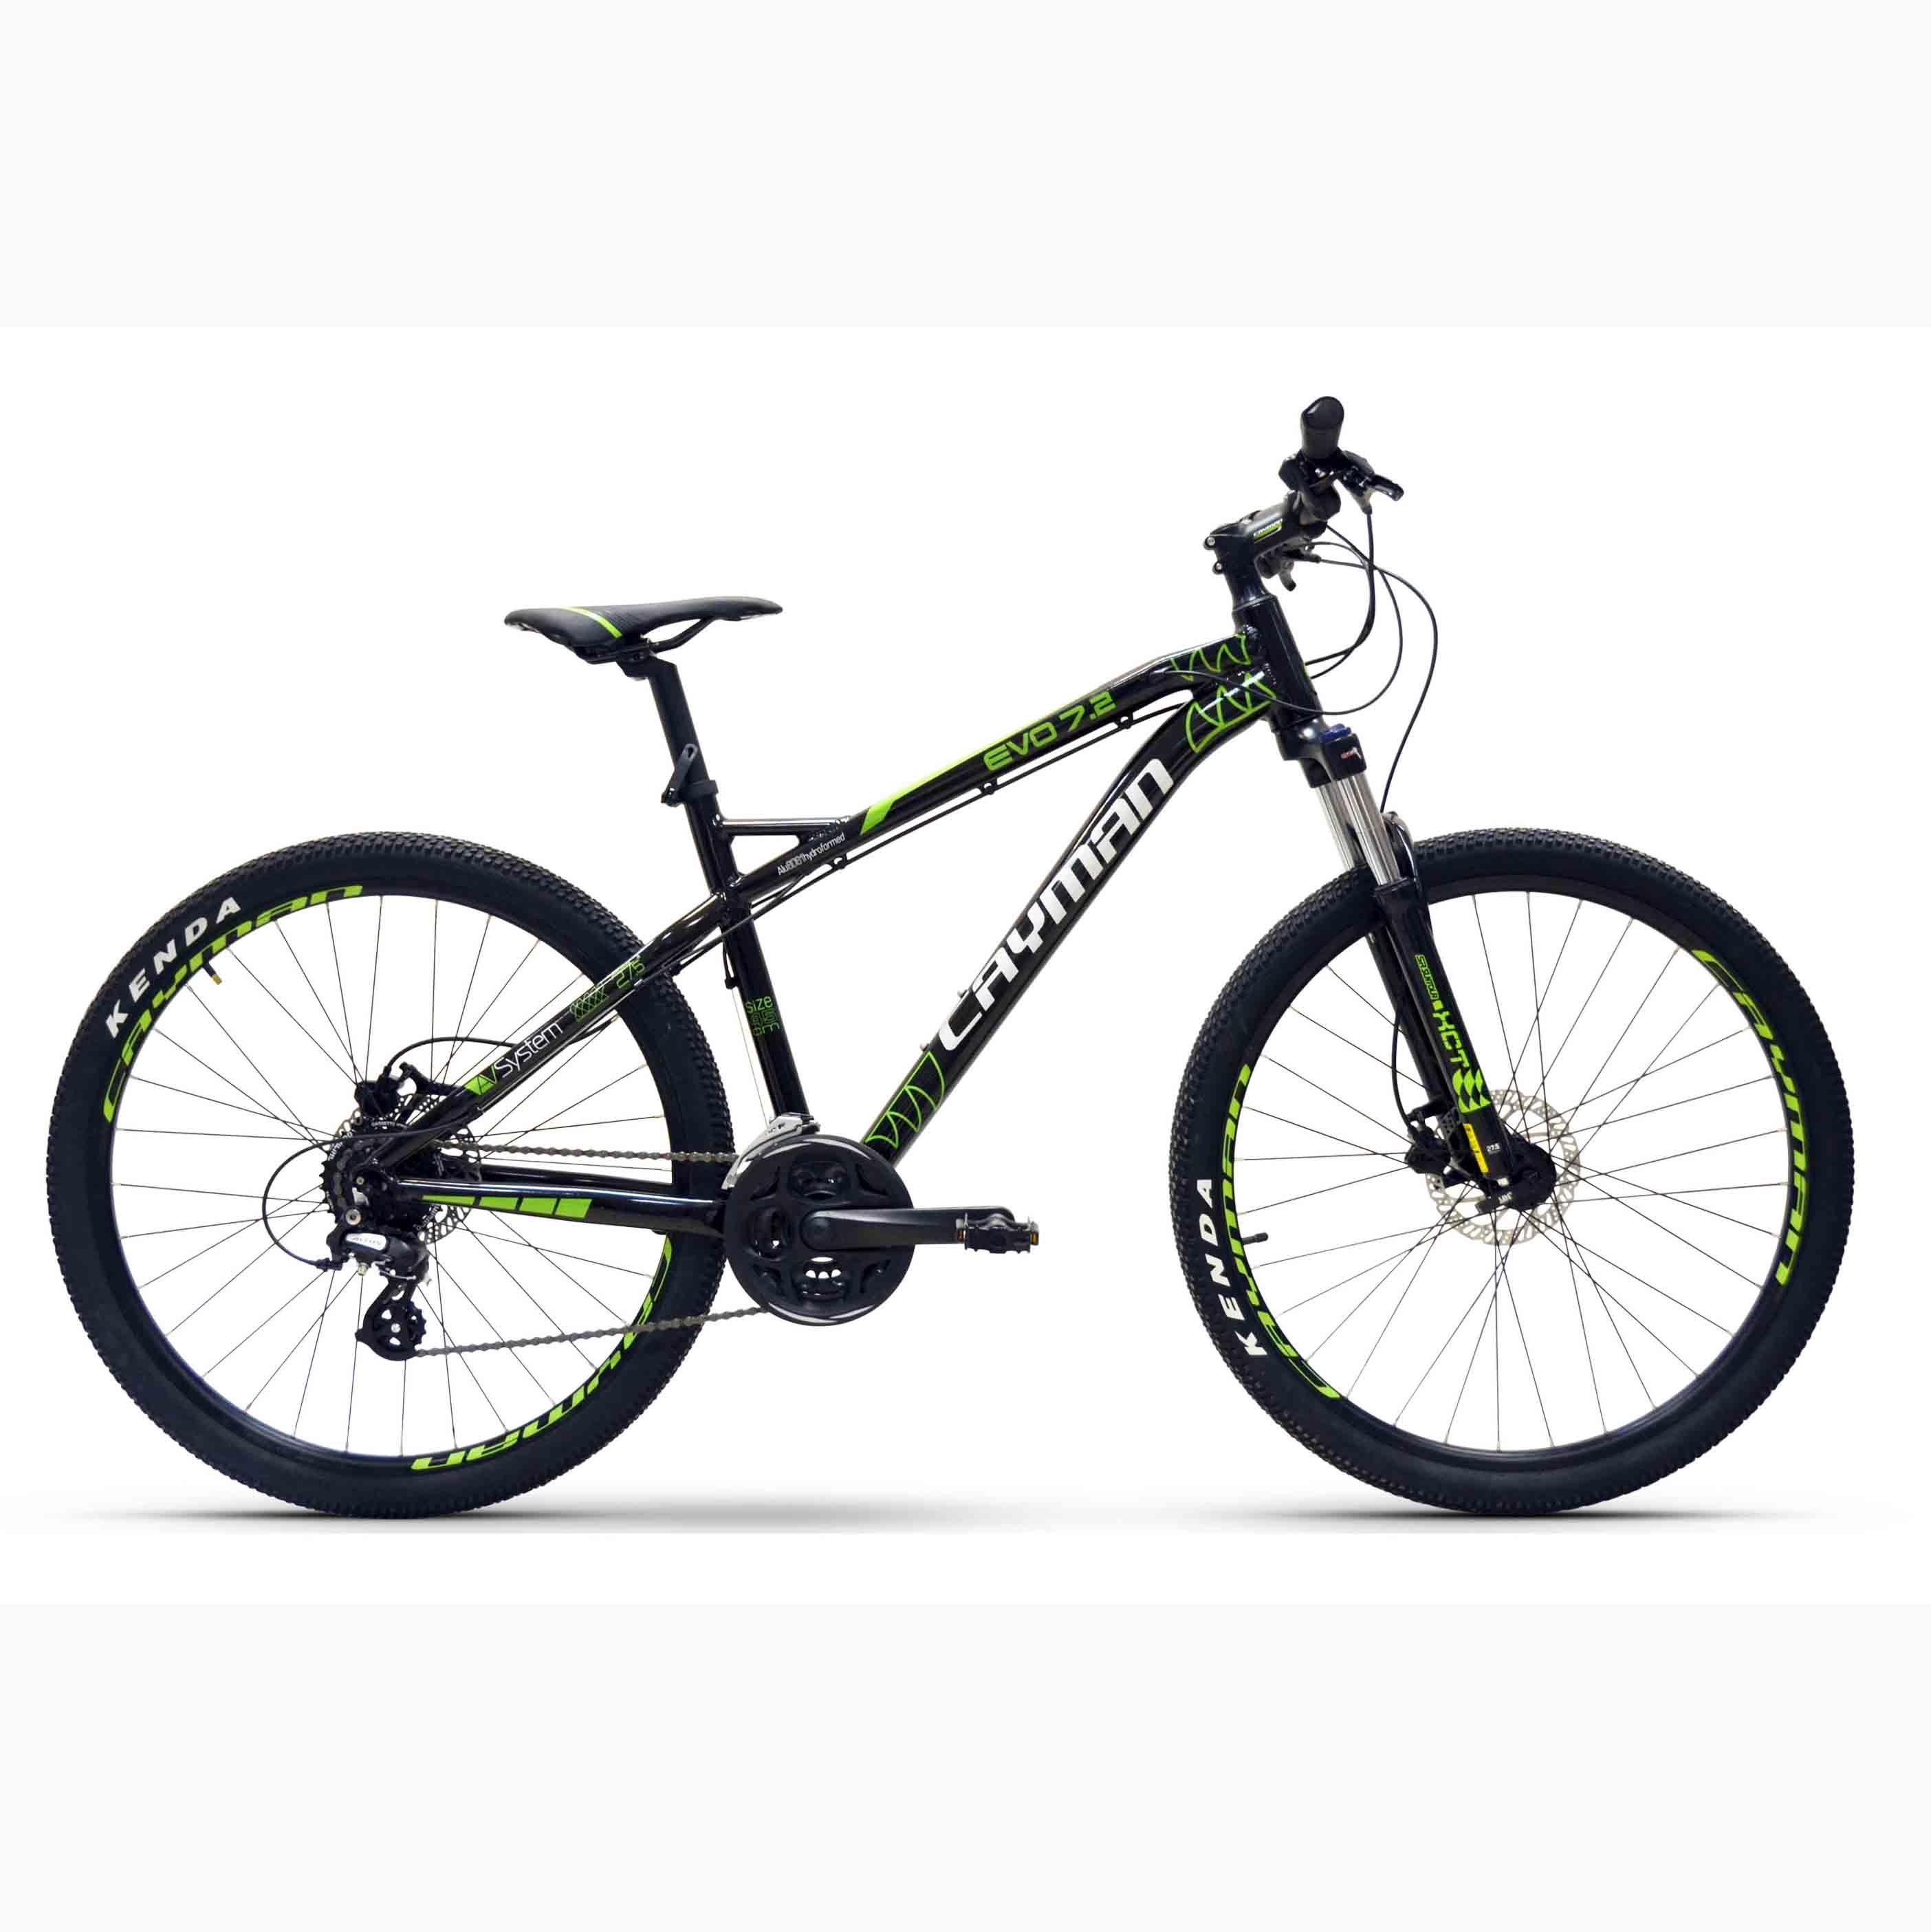 Фото Велосипед Cayman Evo 7.2 27,5″, рама 45см, 2018